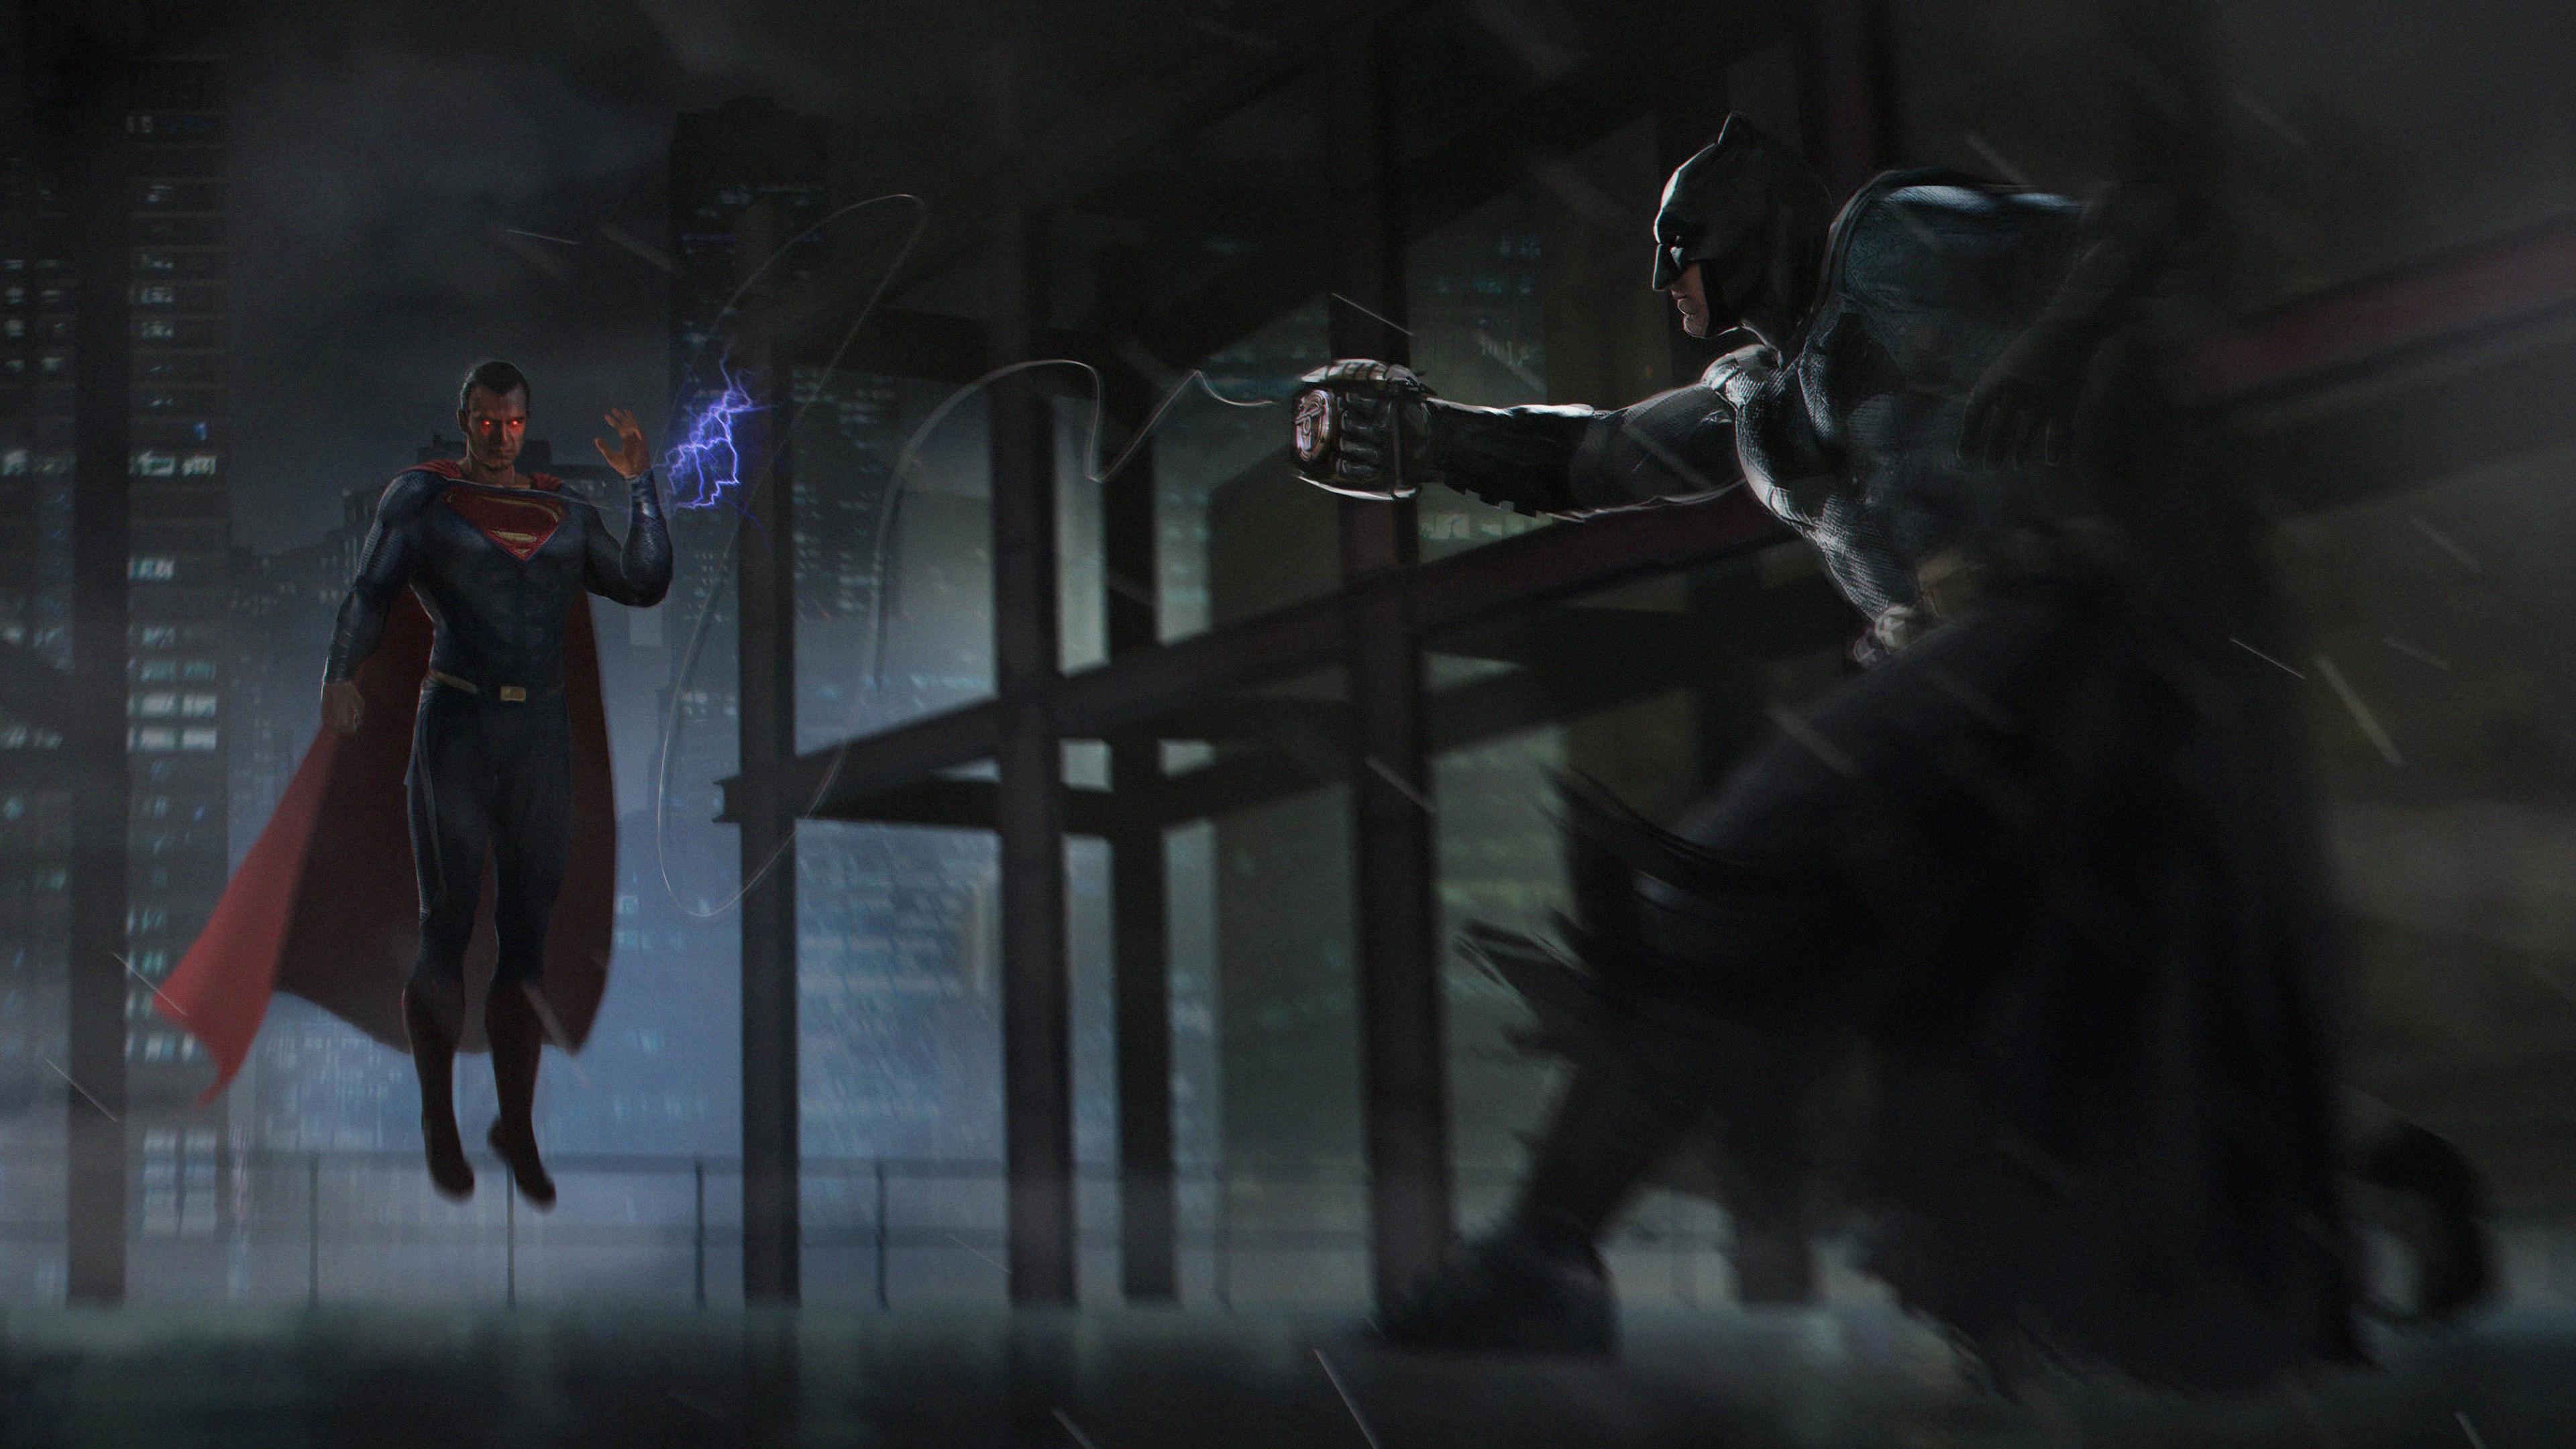 batman vs superman fight fan art 1569186791 - Batman Vs Superman Fight Fan Art - superman wallpapers, superheroes wallpapers, hd-wallpapers, digital art wallpapers, batman wallpapers, batman vs superman wallpapers, artwork wallpapers, artstation wallpapers, artist wallpapers, 4k-wallpapers